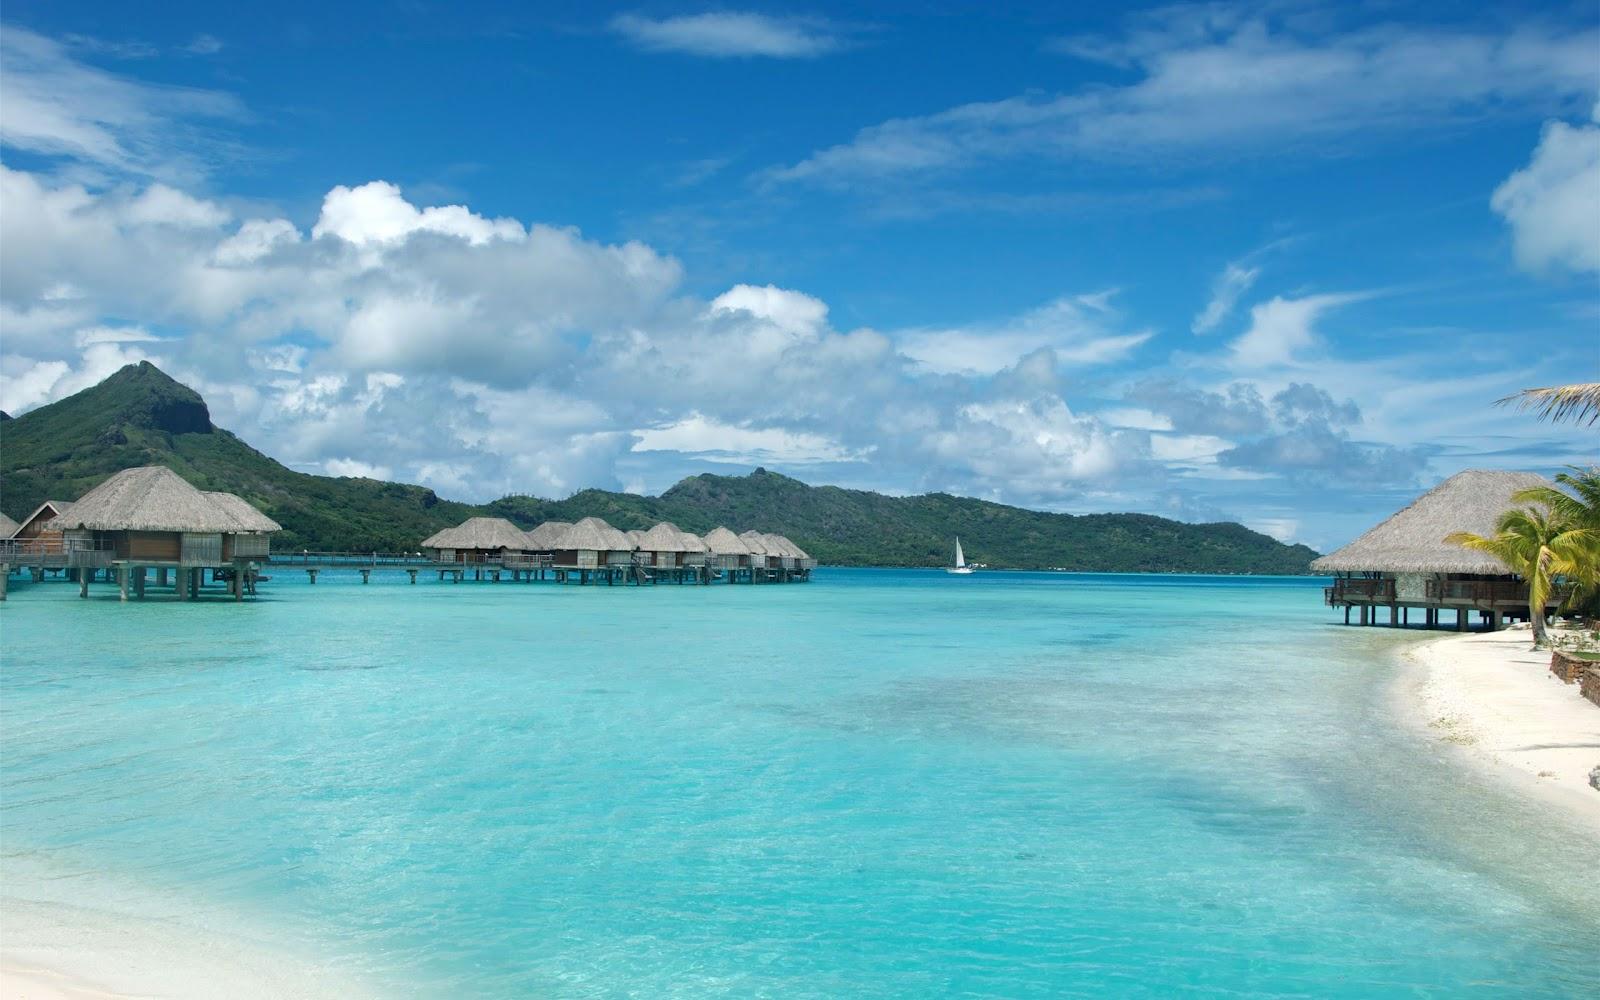 Fashion island newport beach wifi CANON EOS REBEL T5 1200D INSTRUCTION MANUAL